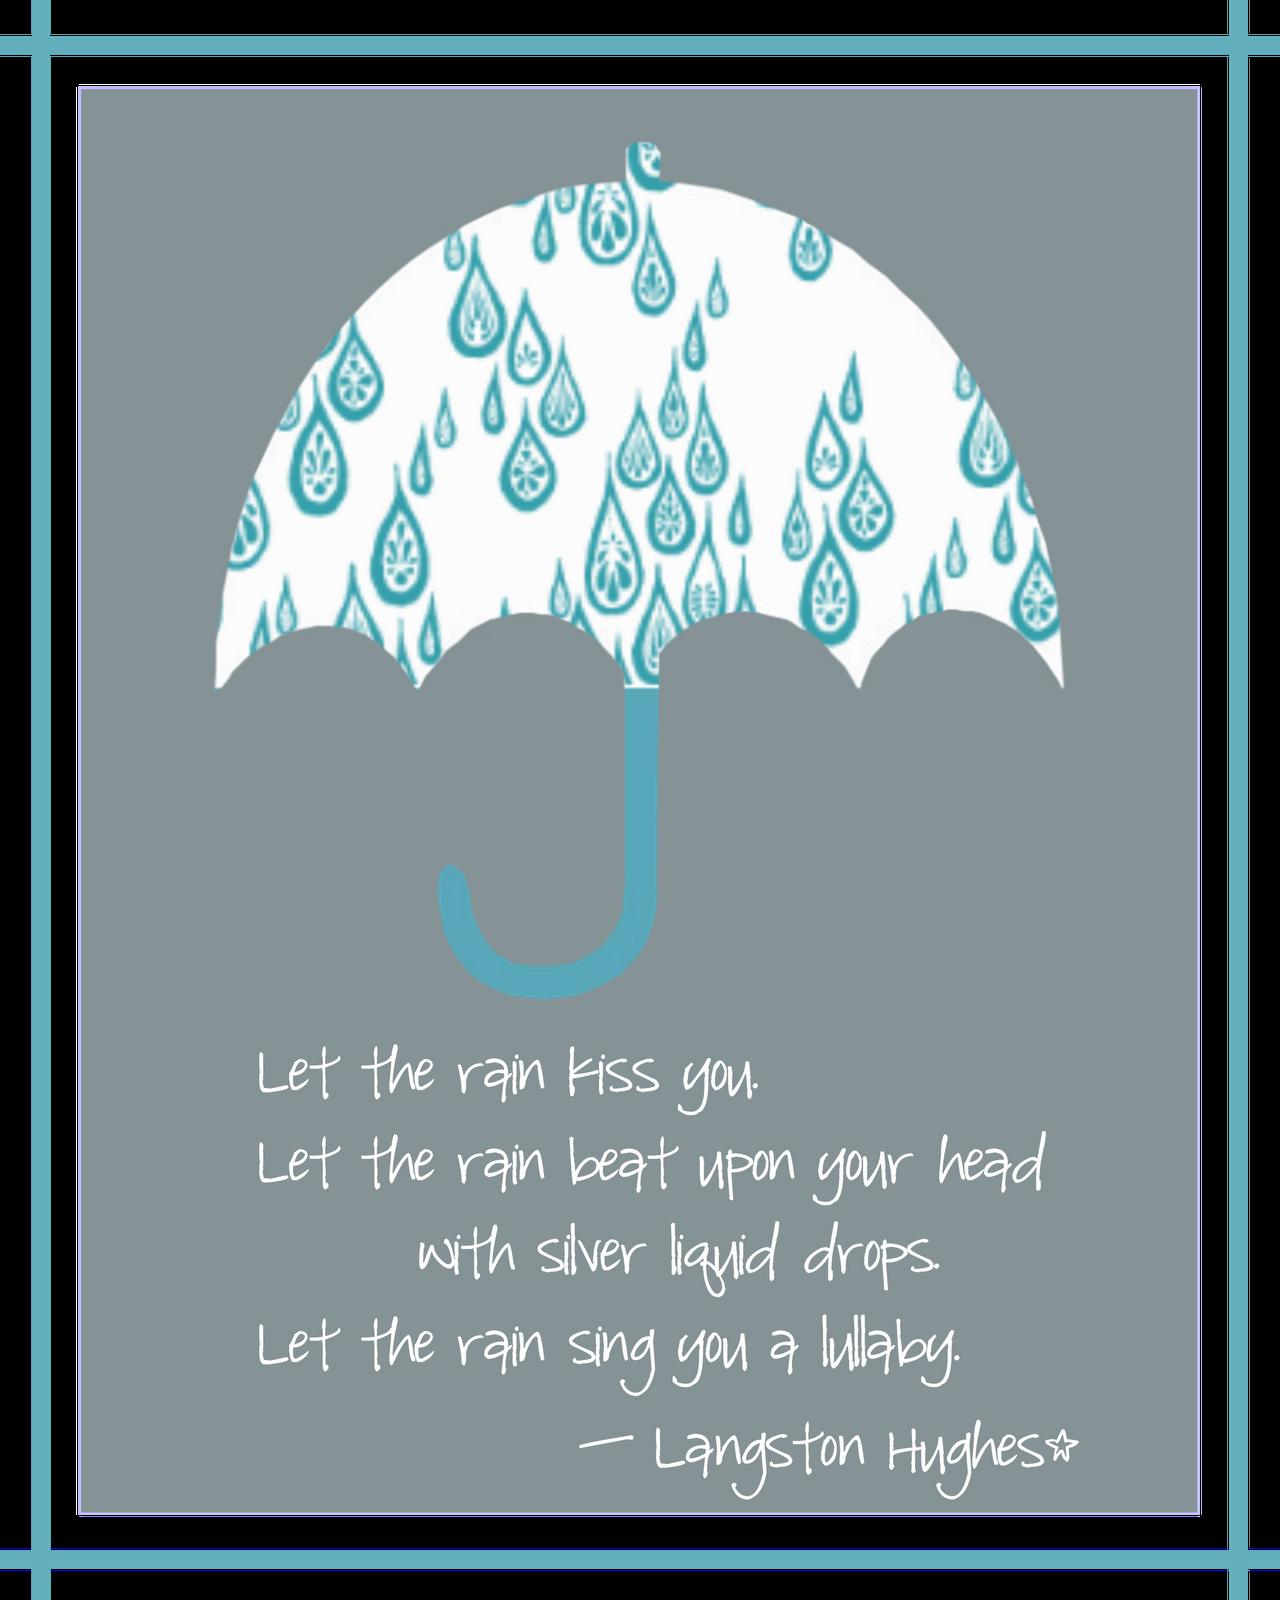 Rainy Day Love Quotes: I Love Rainy Days Quotes. QuotesGram